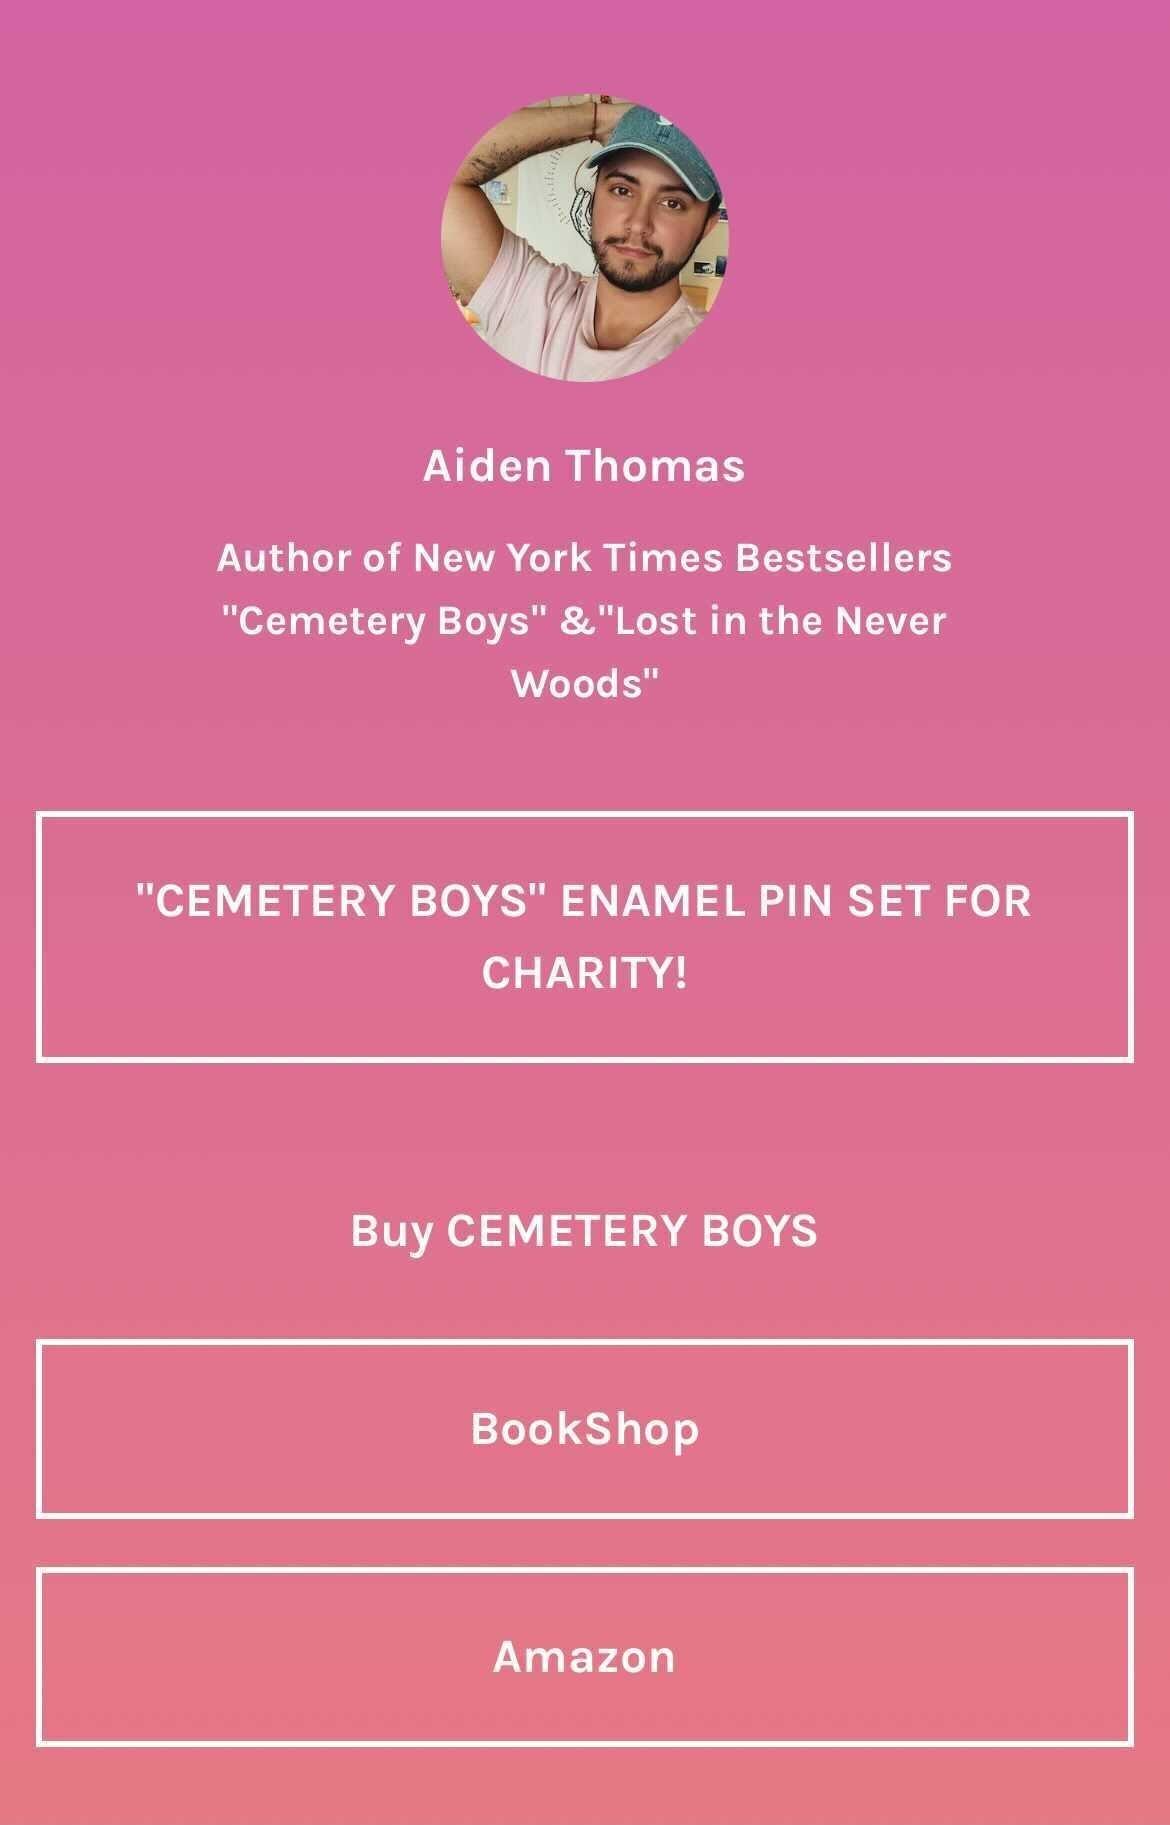 Book Launch Survival Guide — Aiden Thomas